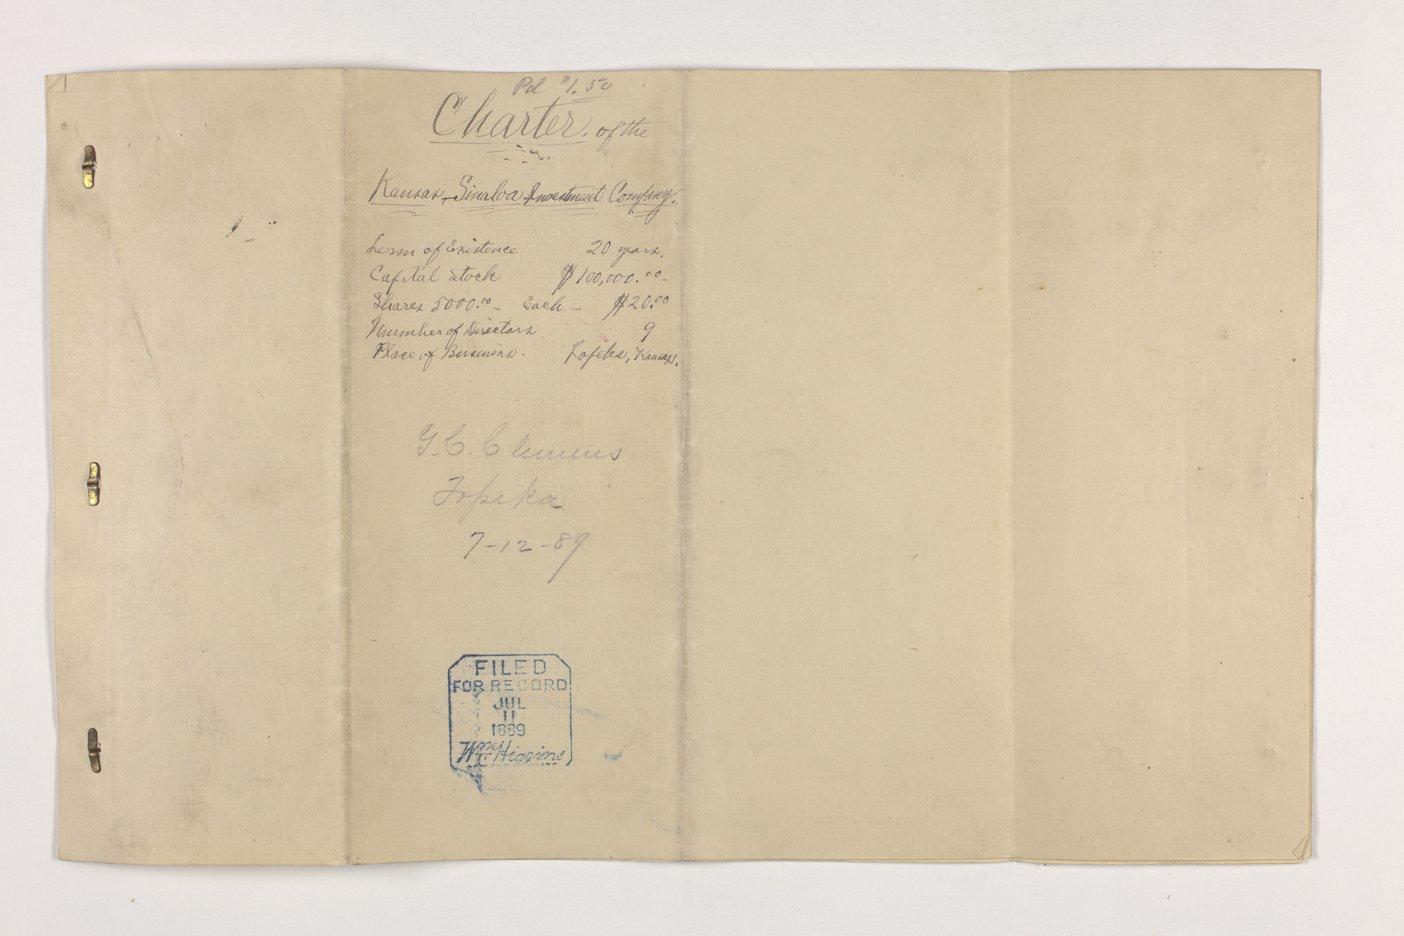 Charter of the Kansas Sinaloa Investment Company, Dickinson County, Kansas - Back cover